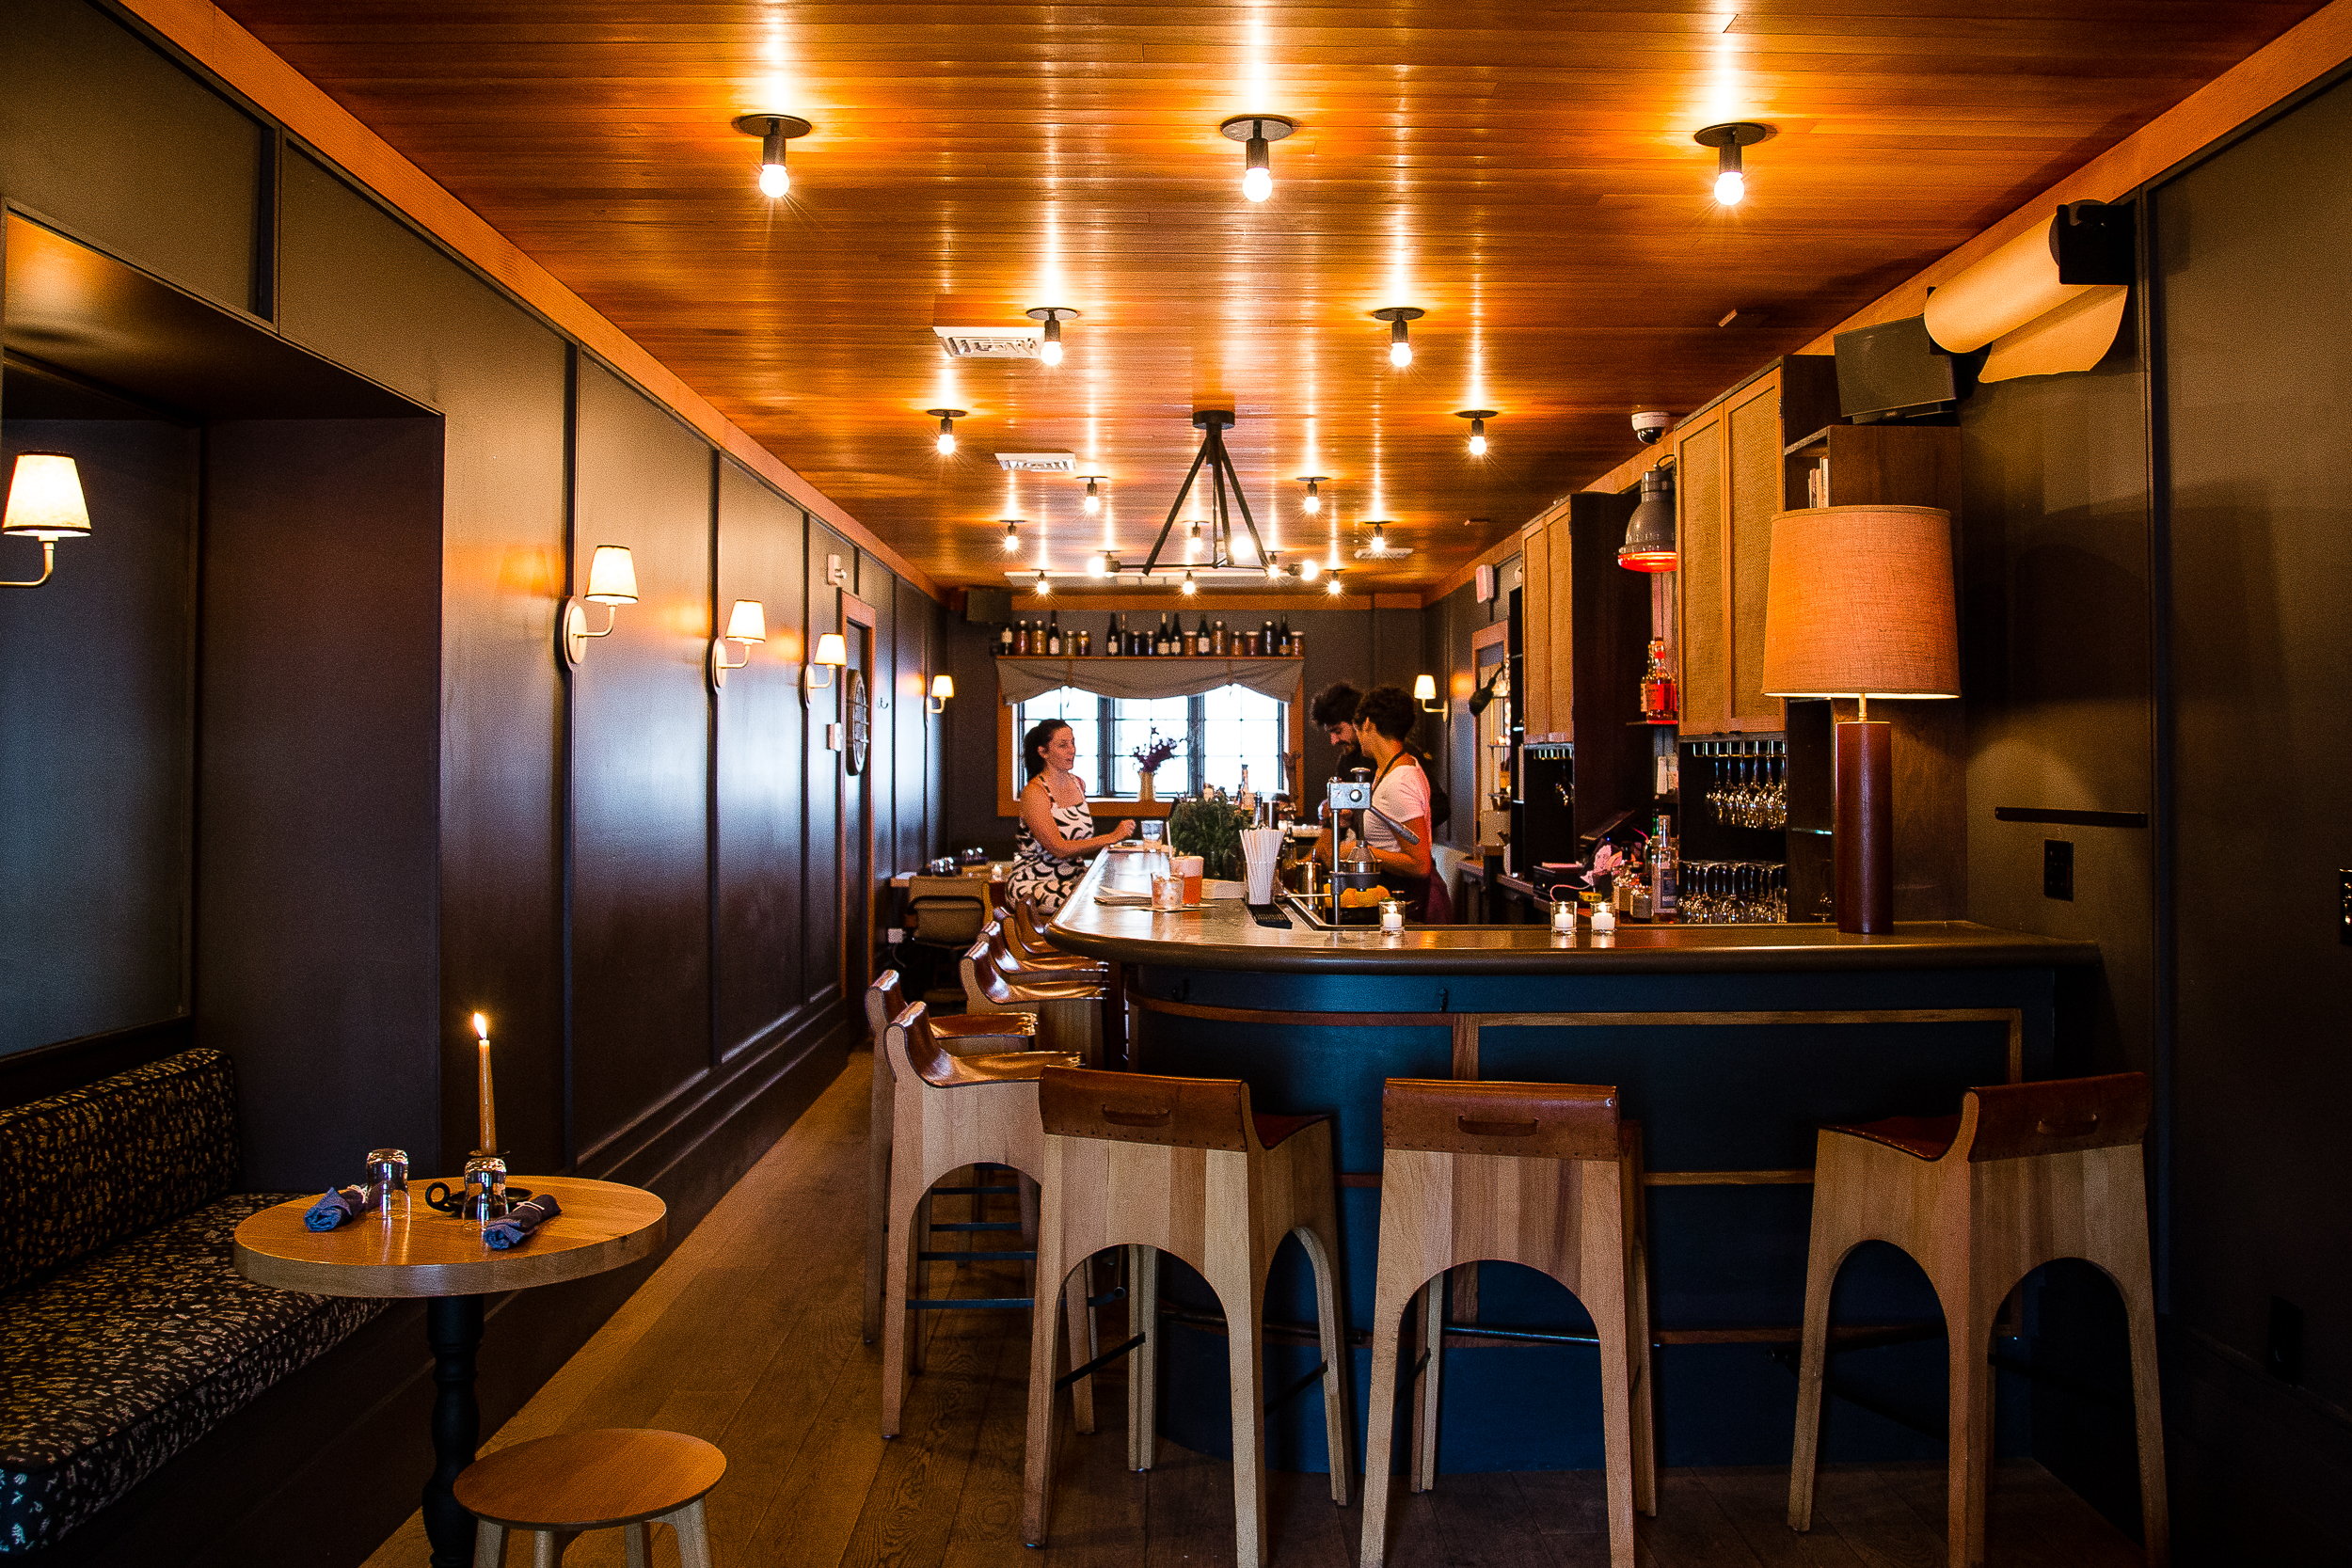 The hotel restaurant/tavern